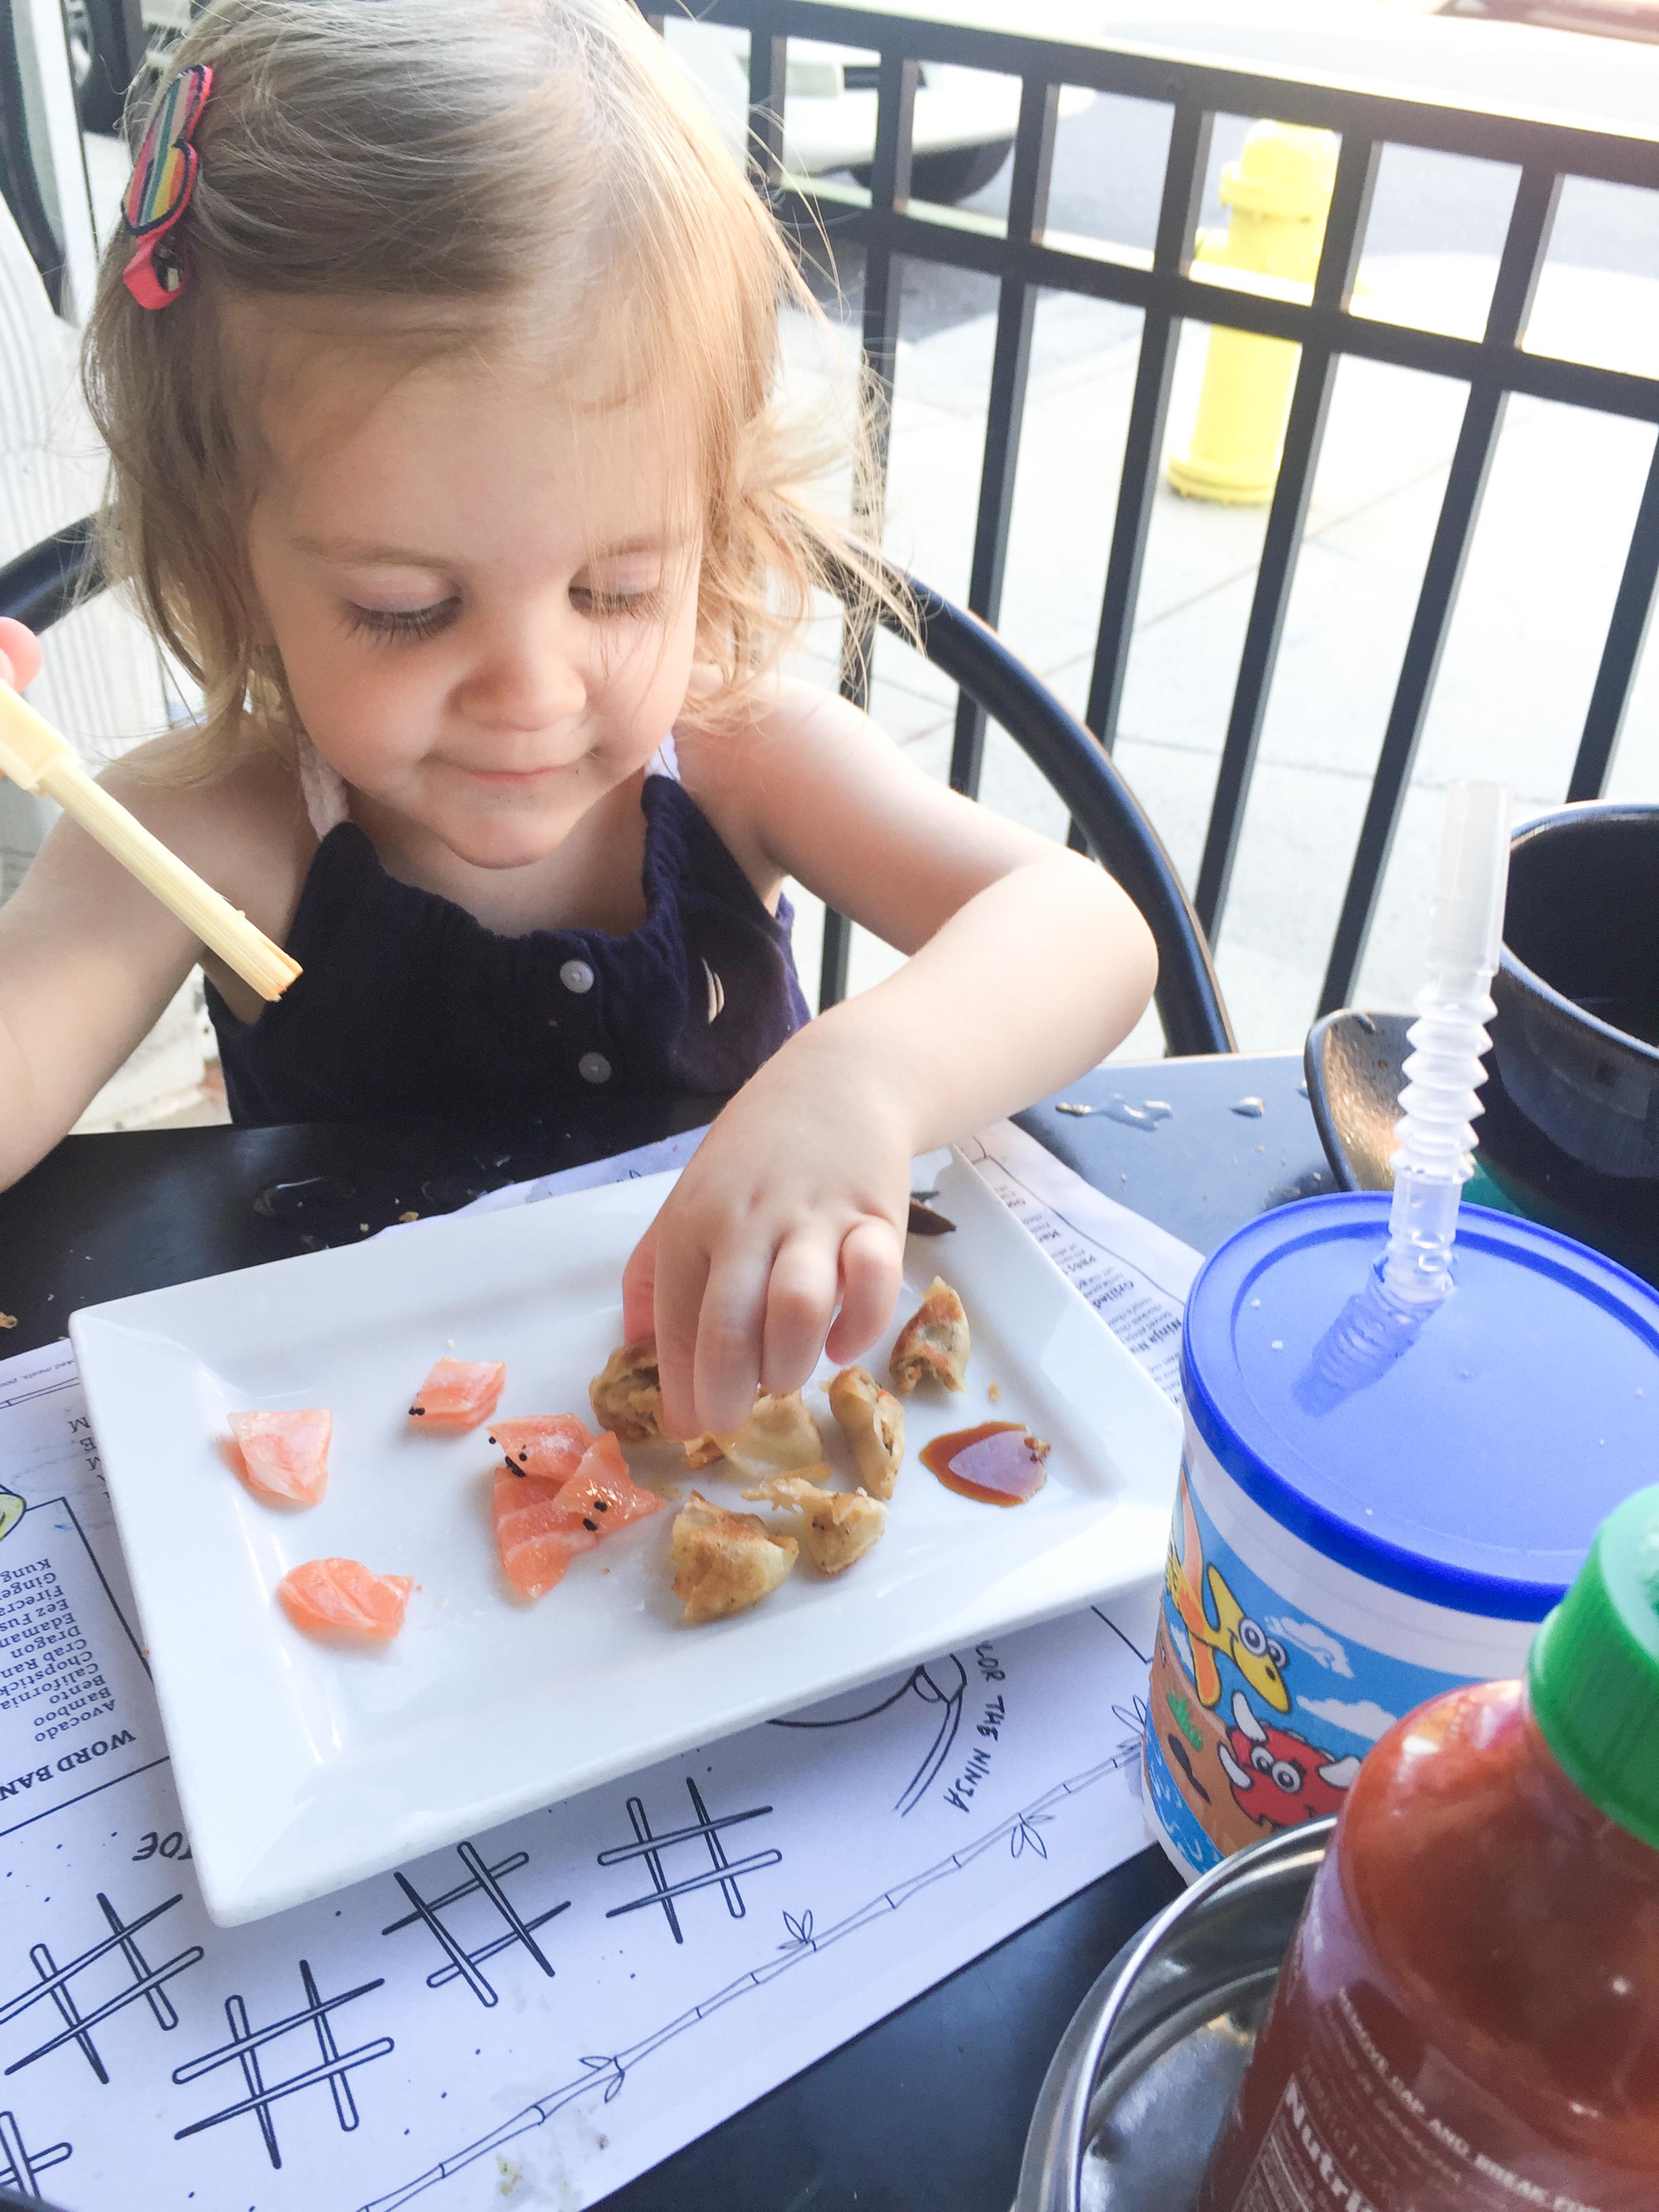 eez-fusion-sushi-huntersville-nc-toddler-sashimi-chopsticks